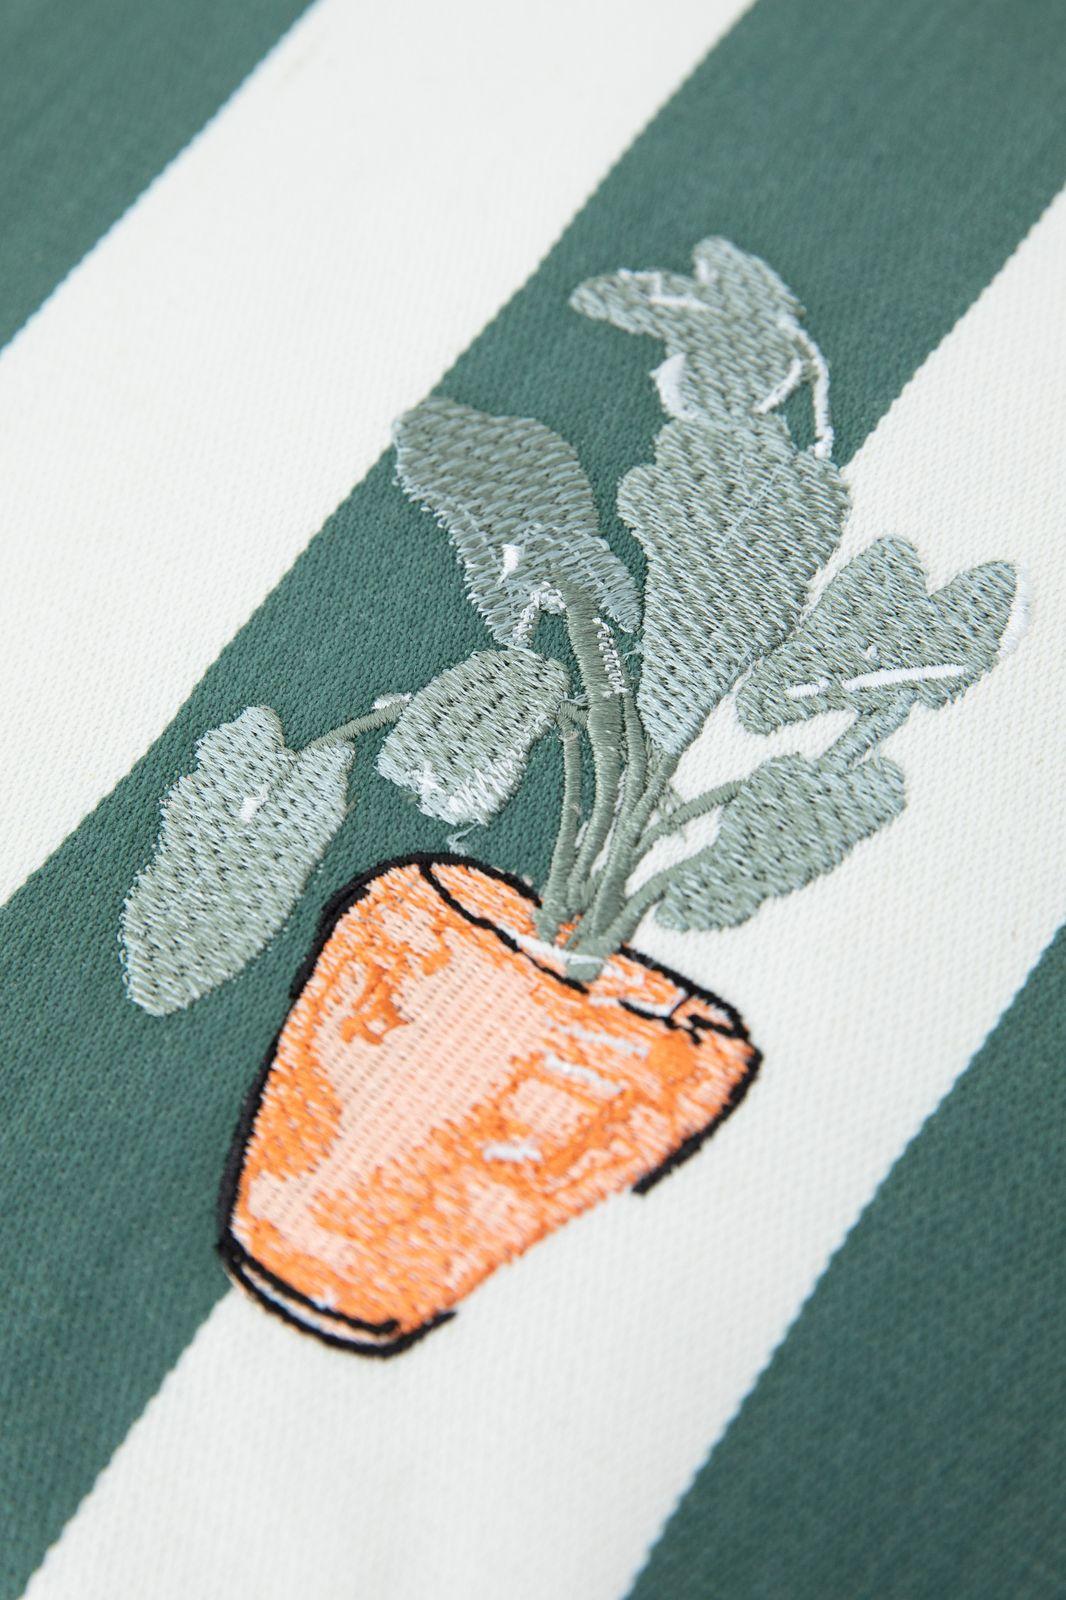 Sierkussen gestreept met plant embroidery